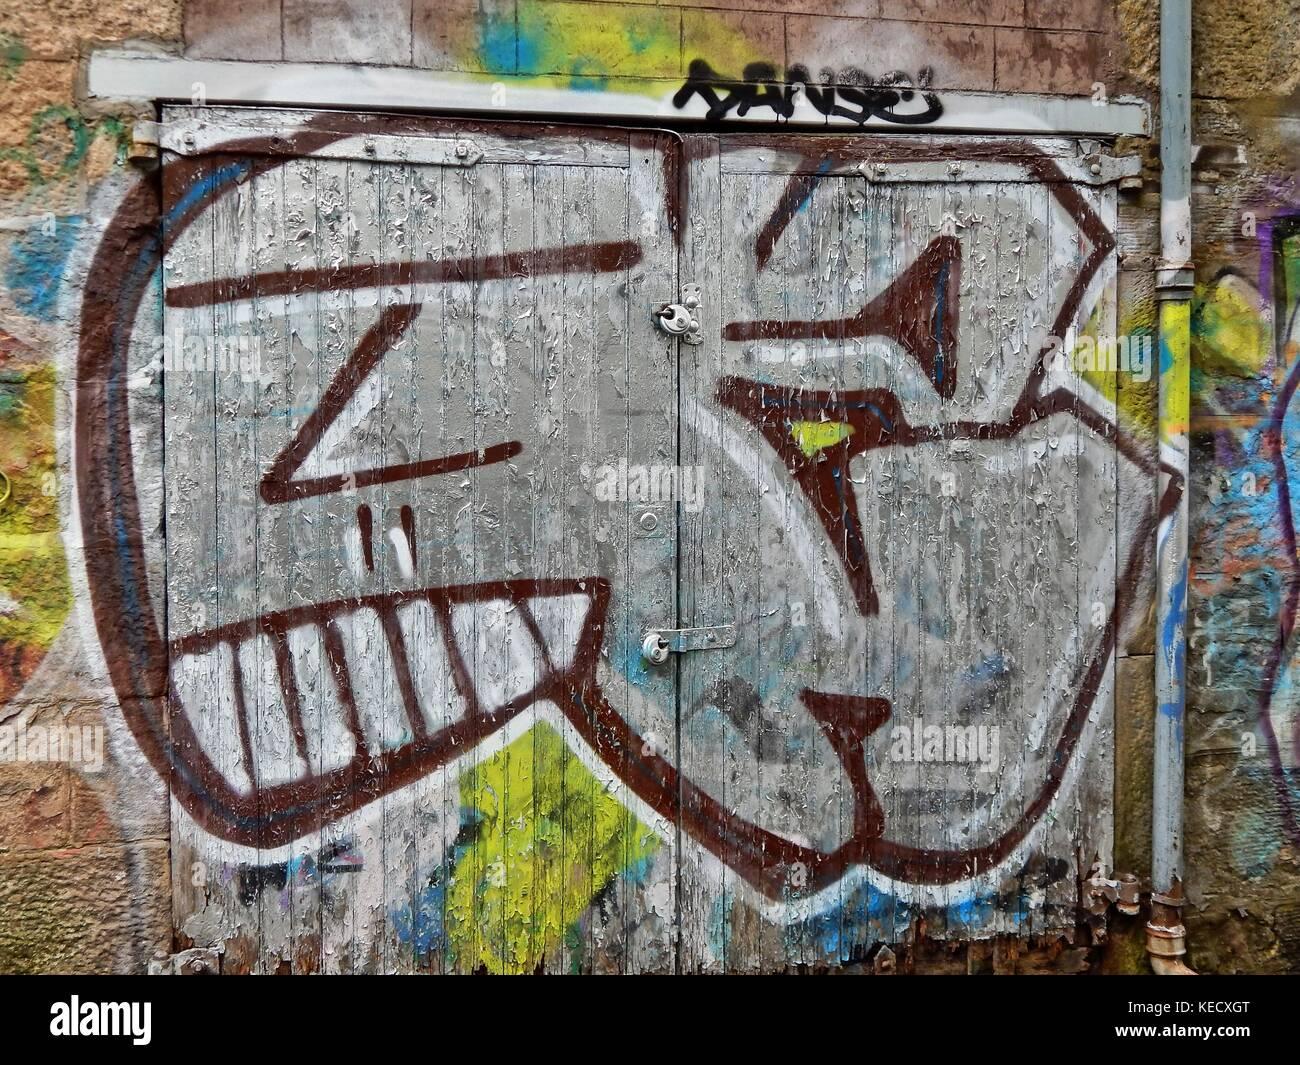 Edinburgh graffiti stock image